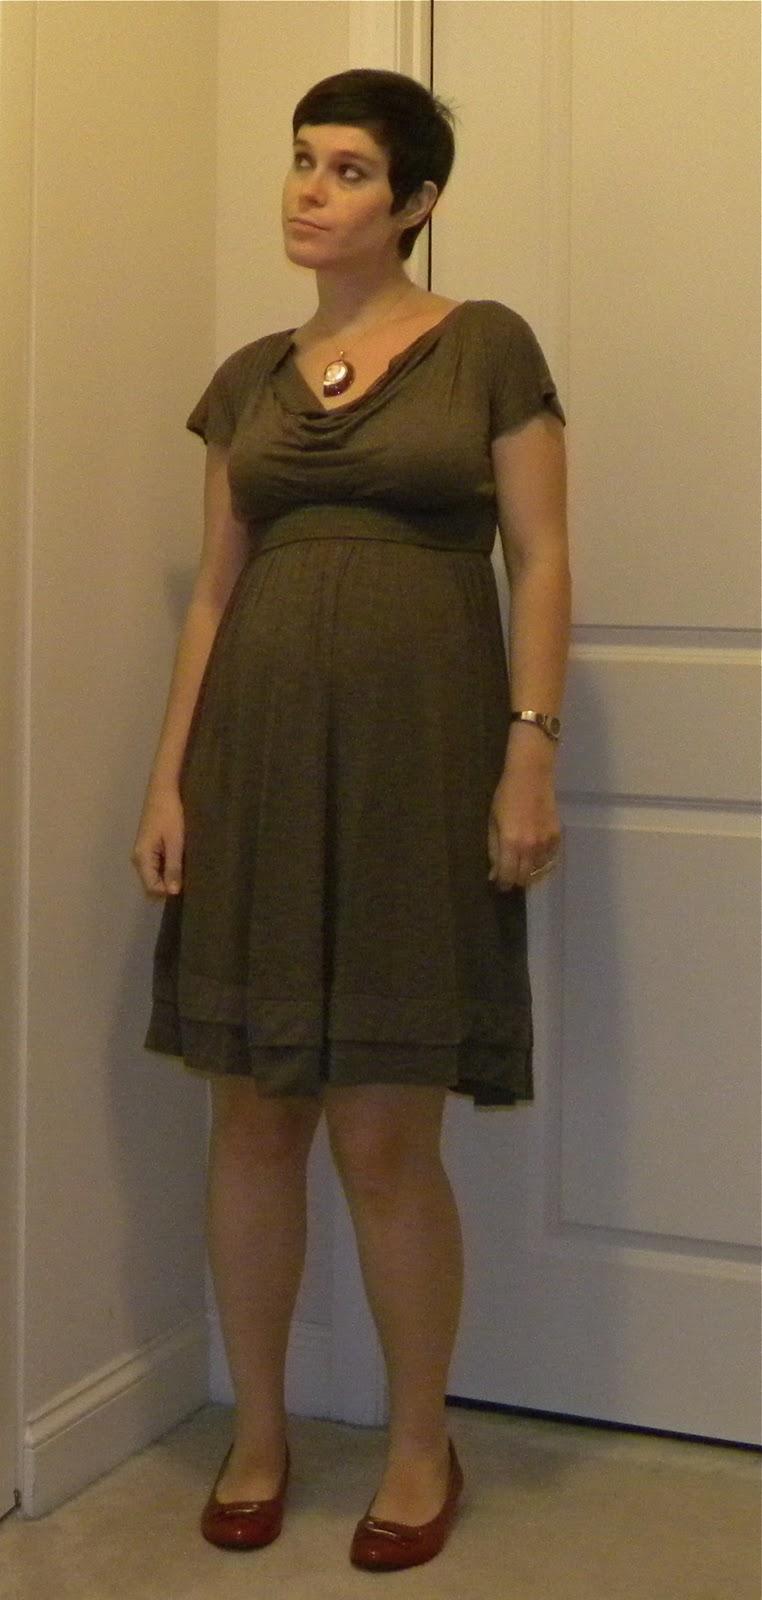 Buying my husband dresses